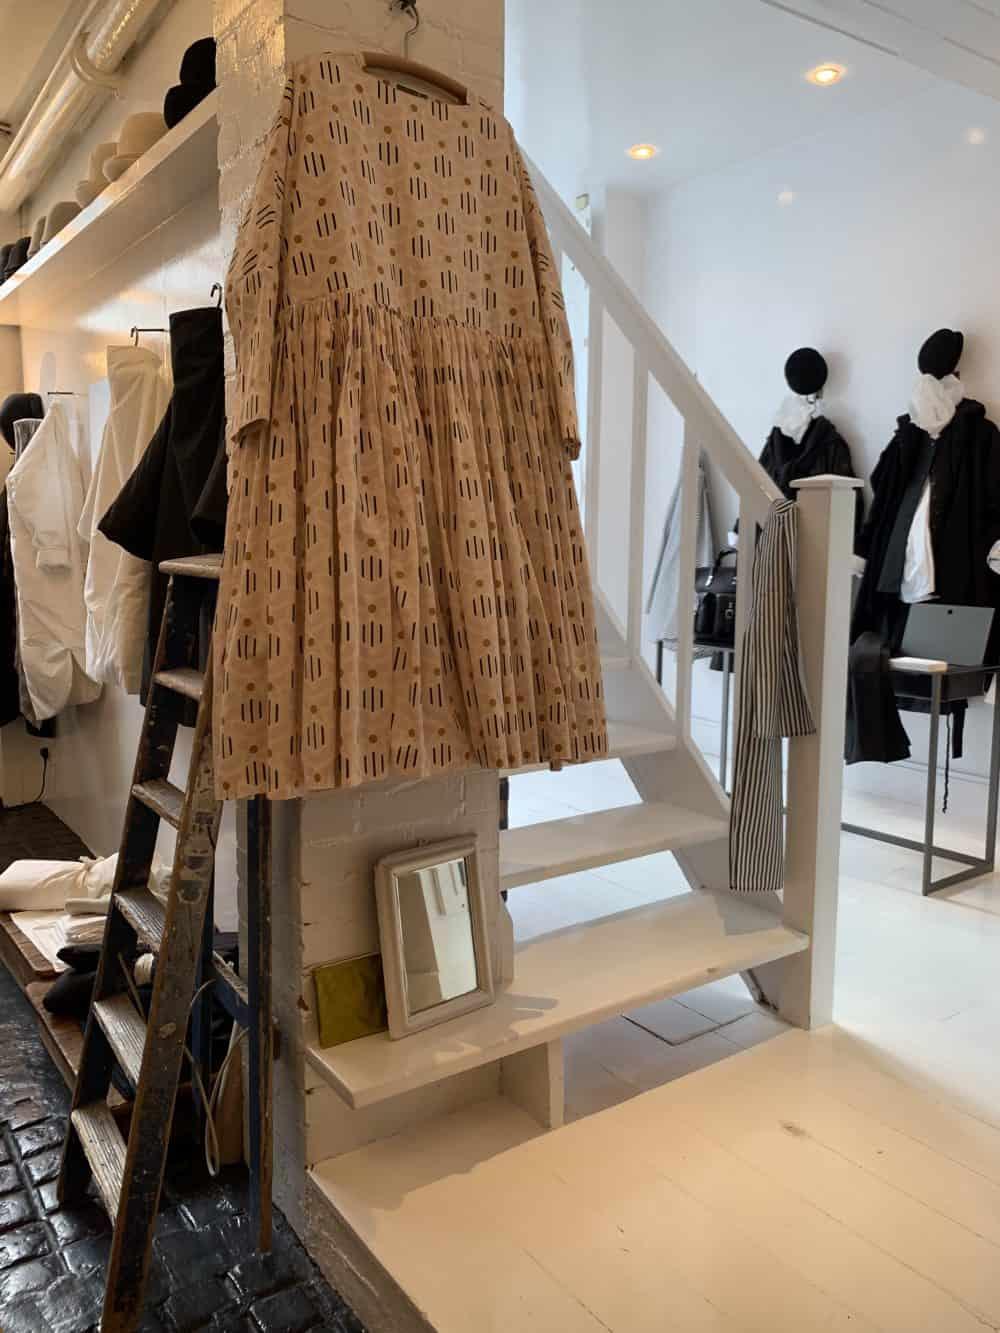 Egg, Dover Street Market, Fashion Tours London, shopping tours london, personal styling London